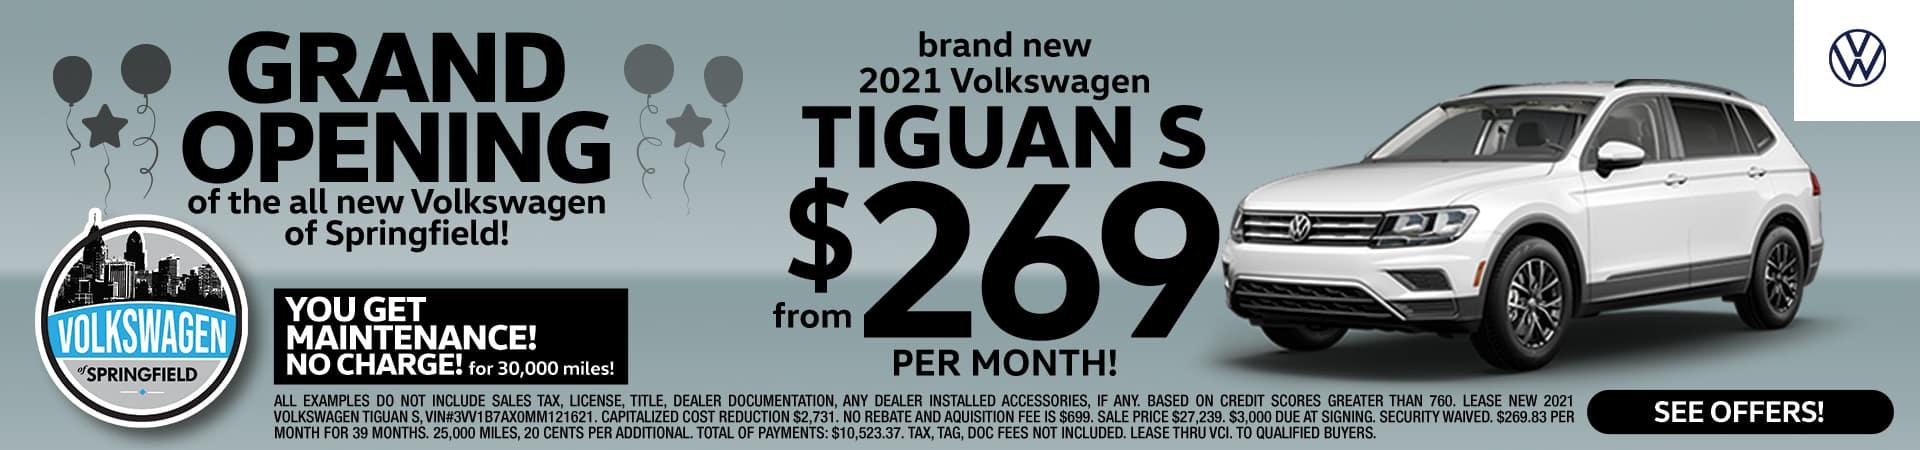 VWS_Tiguan_1920x450_slider_060921